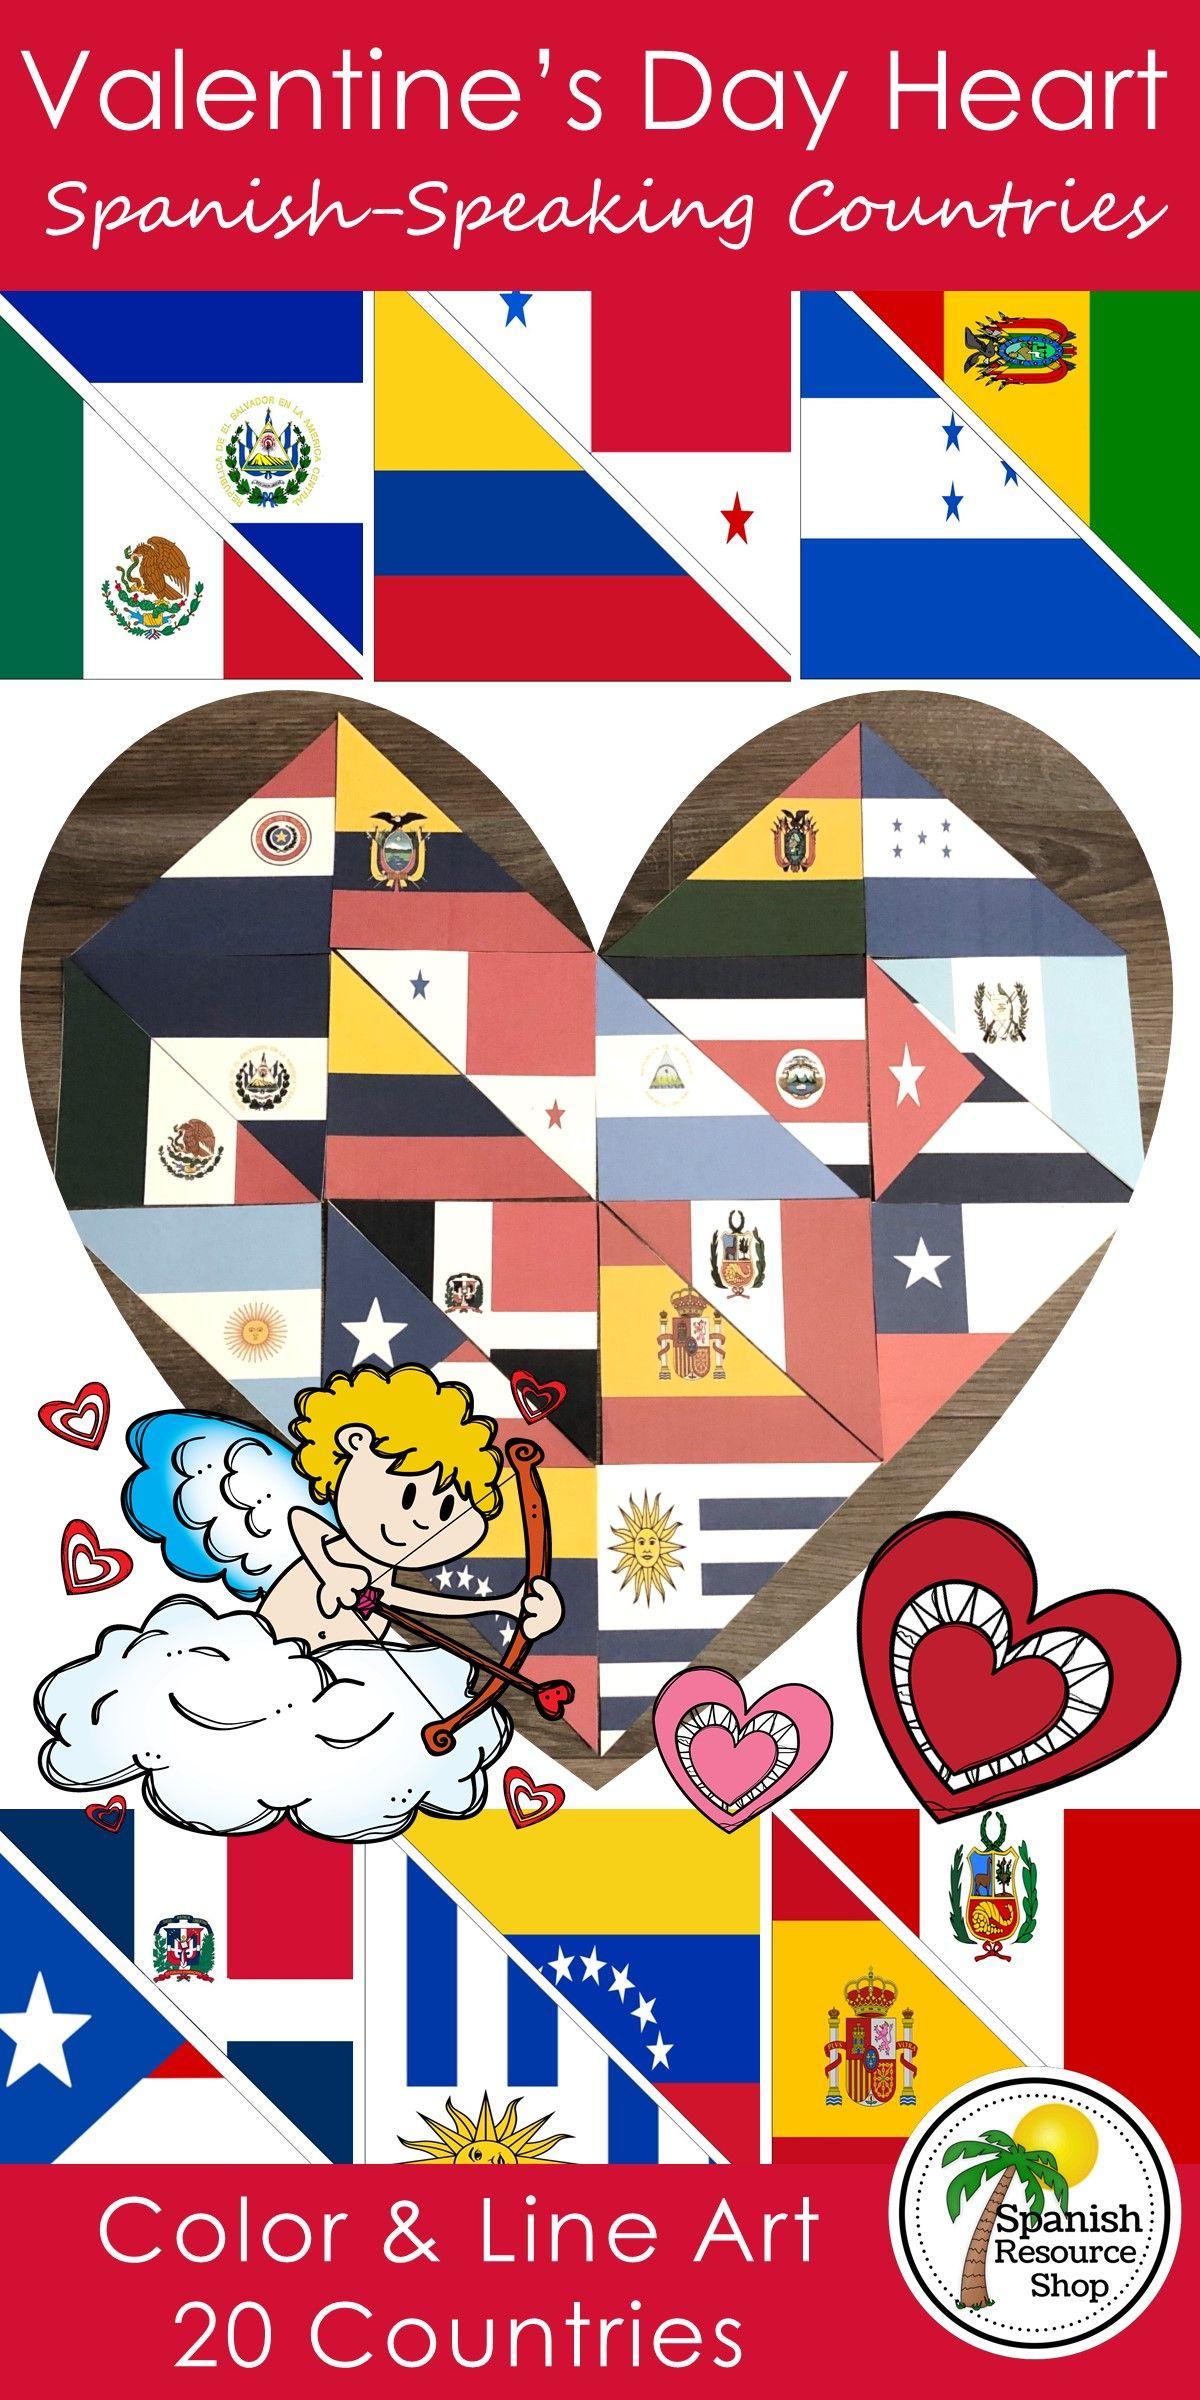 Spanish Speaking Countries Valentine S Day Heart